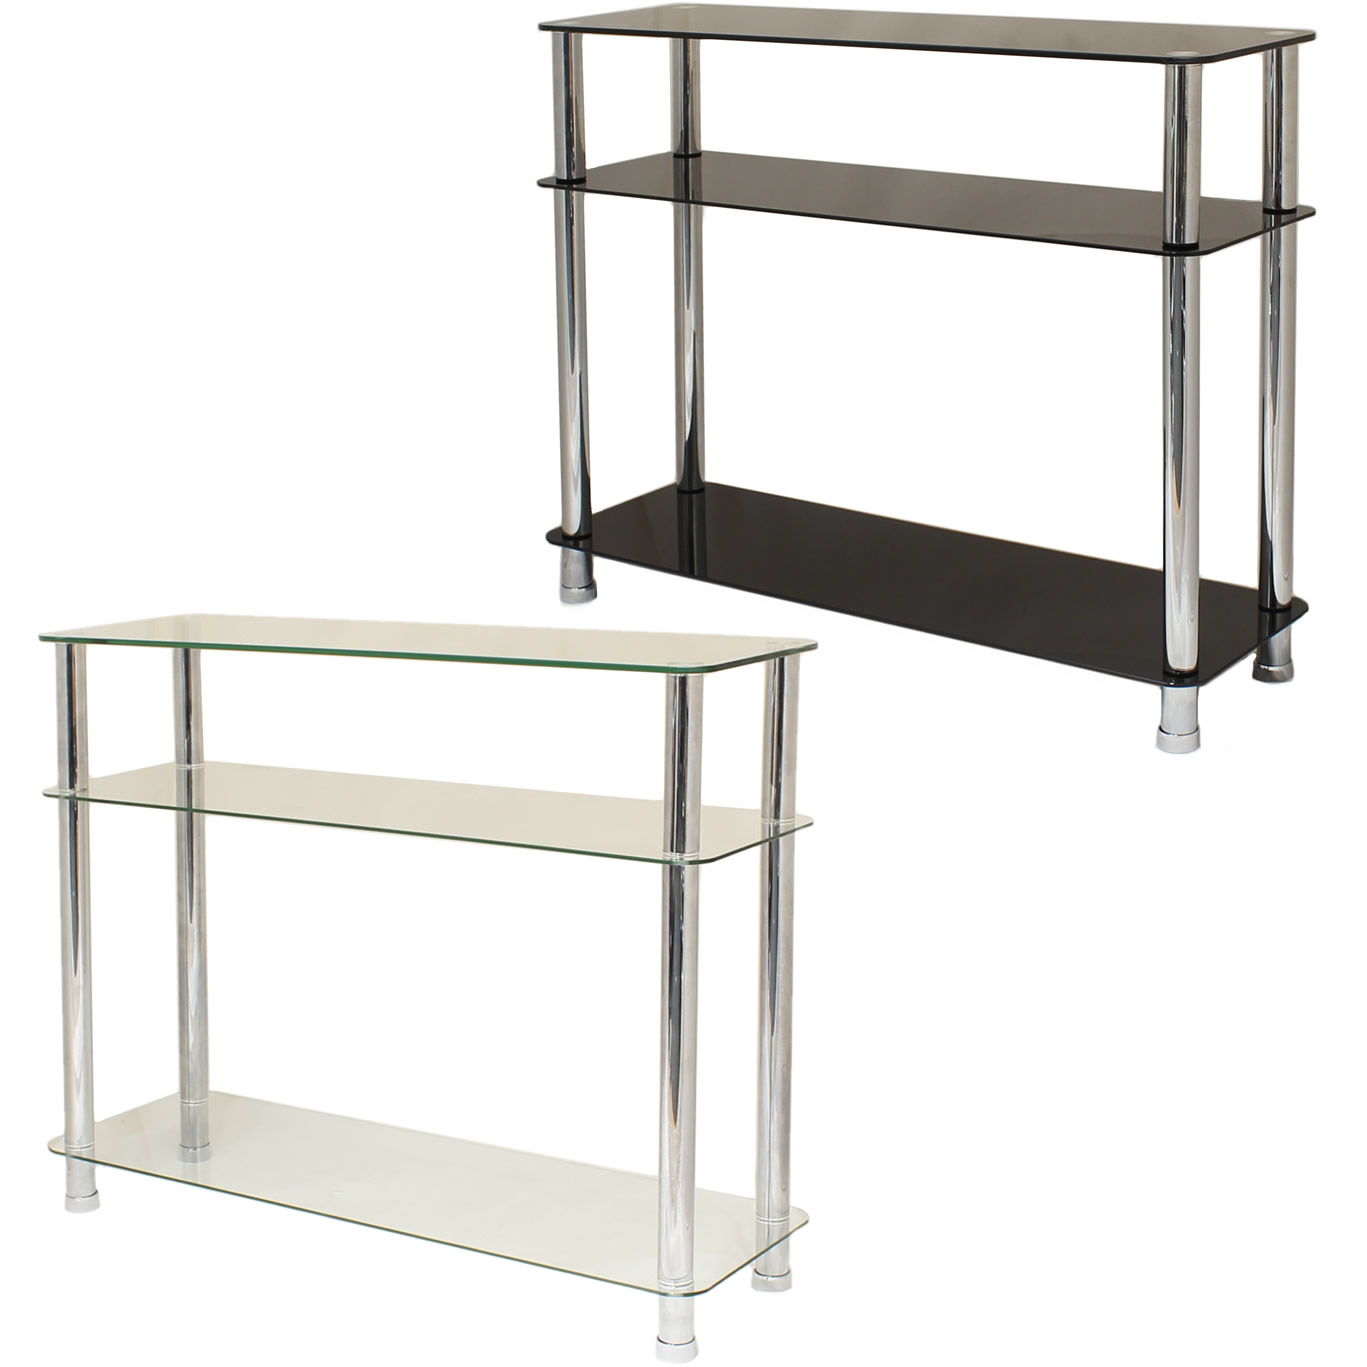 GLASS 3 TIER SIDE/CONSOLE TABLE SHELF UNIT BEDROOM/LOUNGE